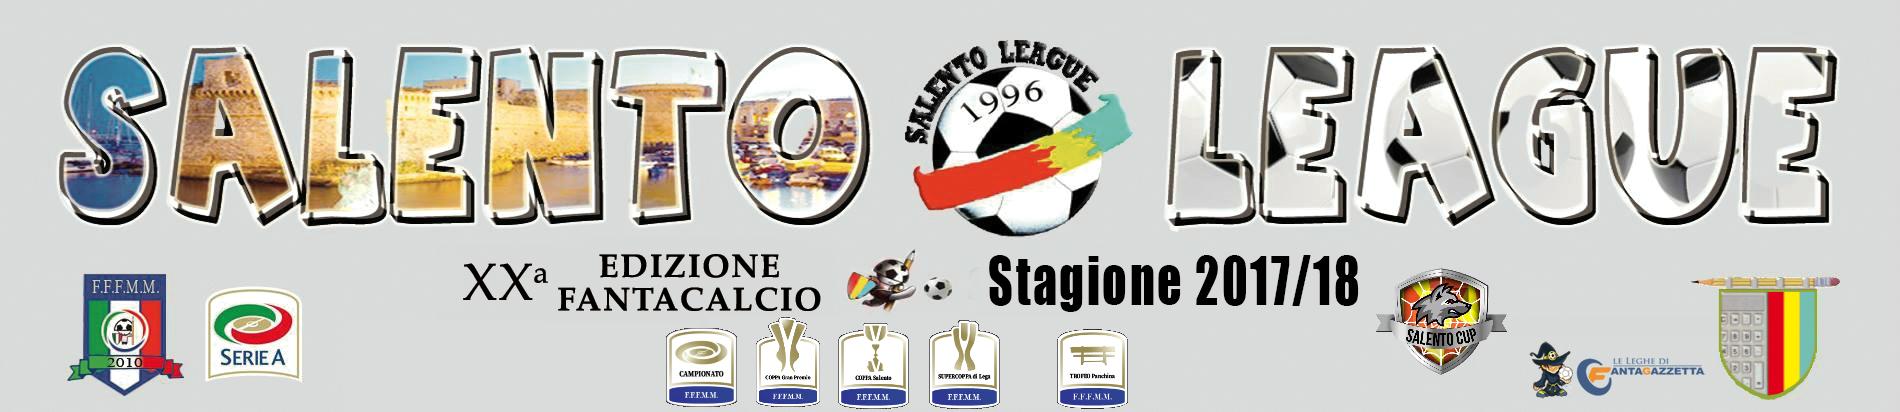 banner_salentoleague 17-18_competizioni